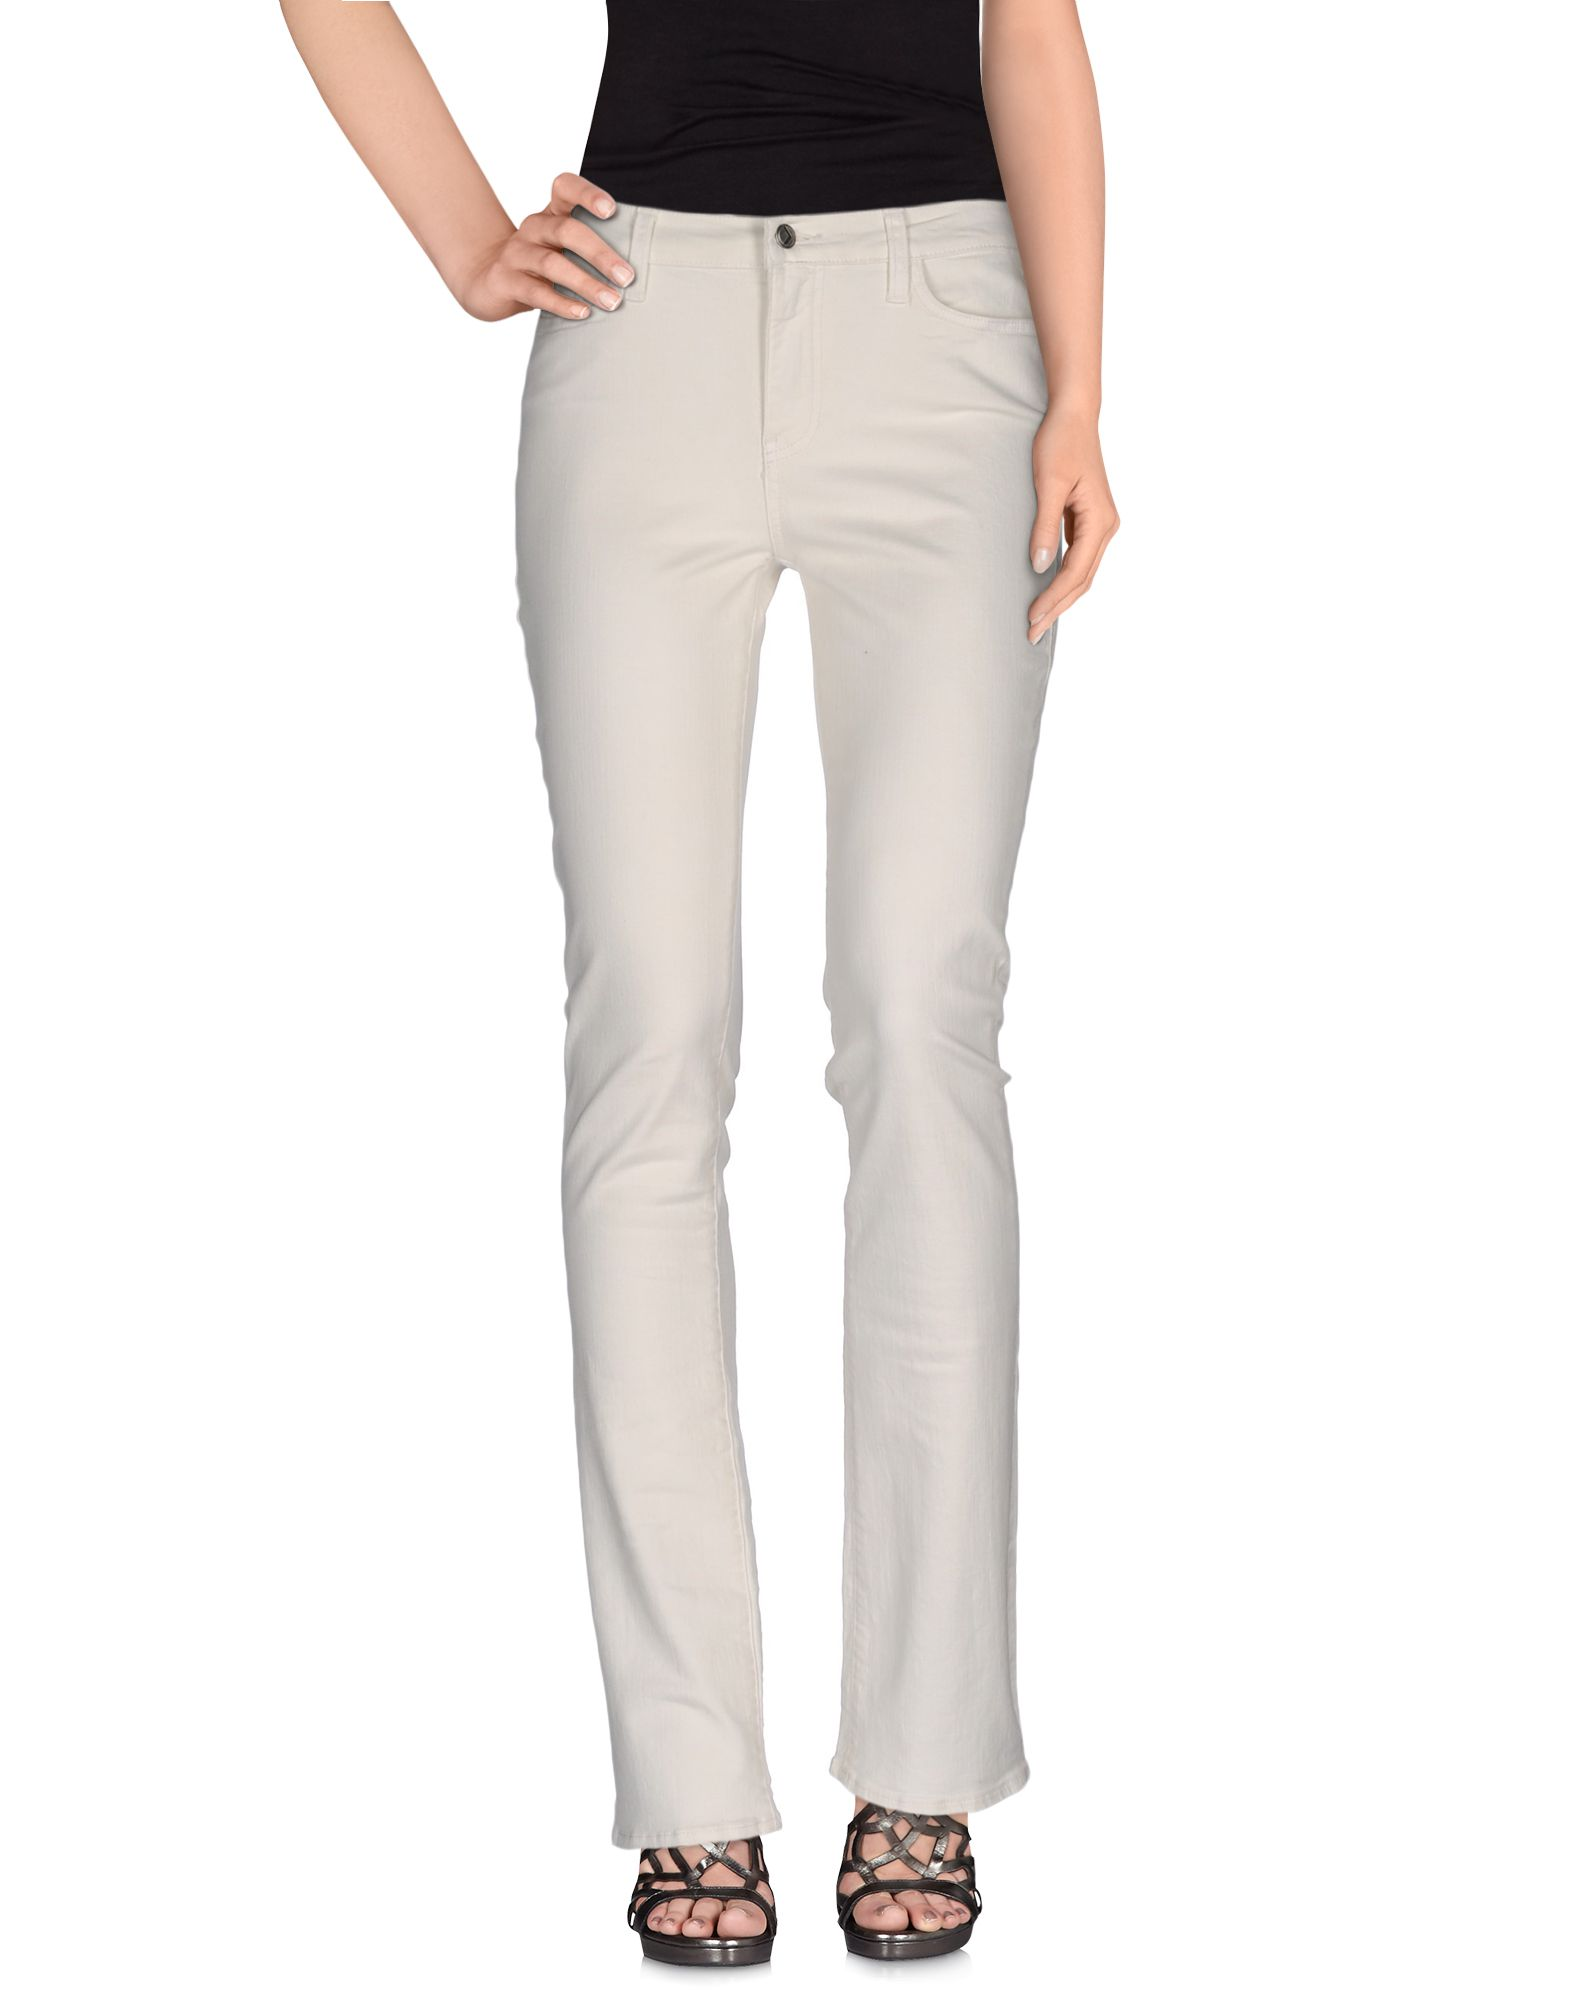 ELIN KLING for MARCIANO Джинсовые брюки цены онлайн